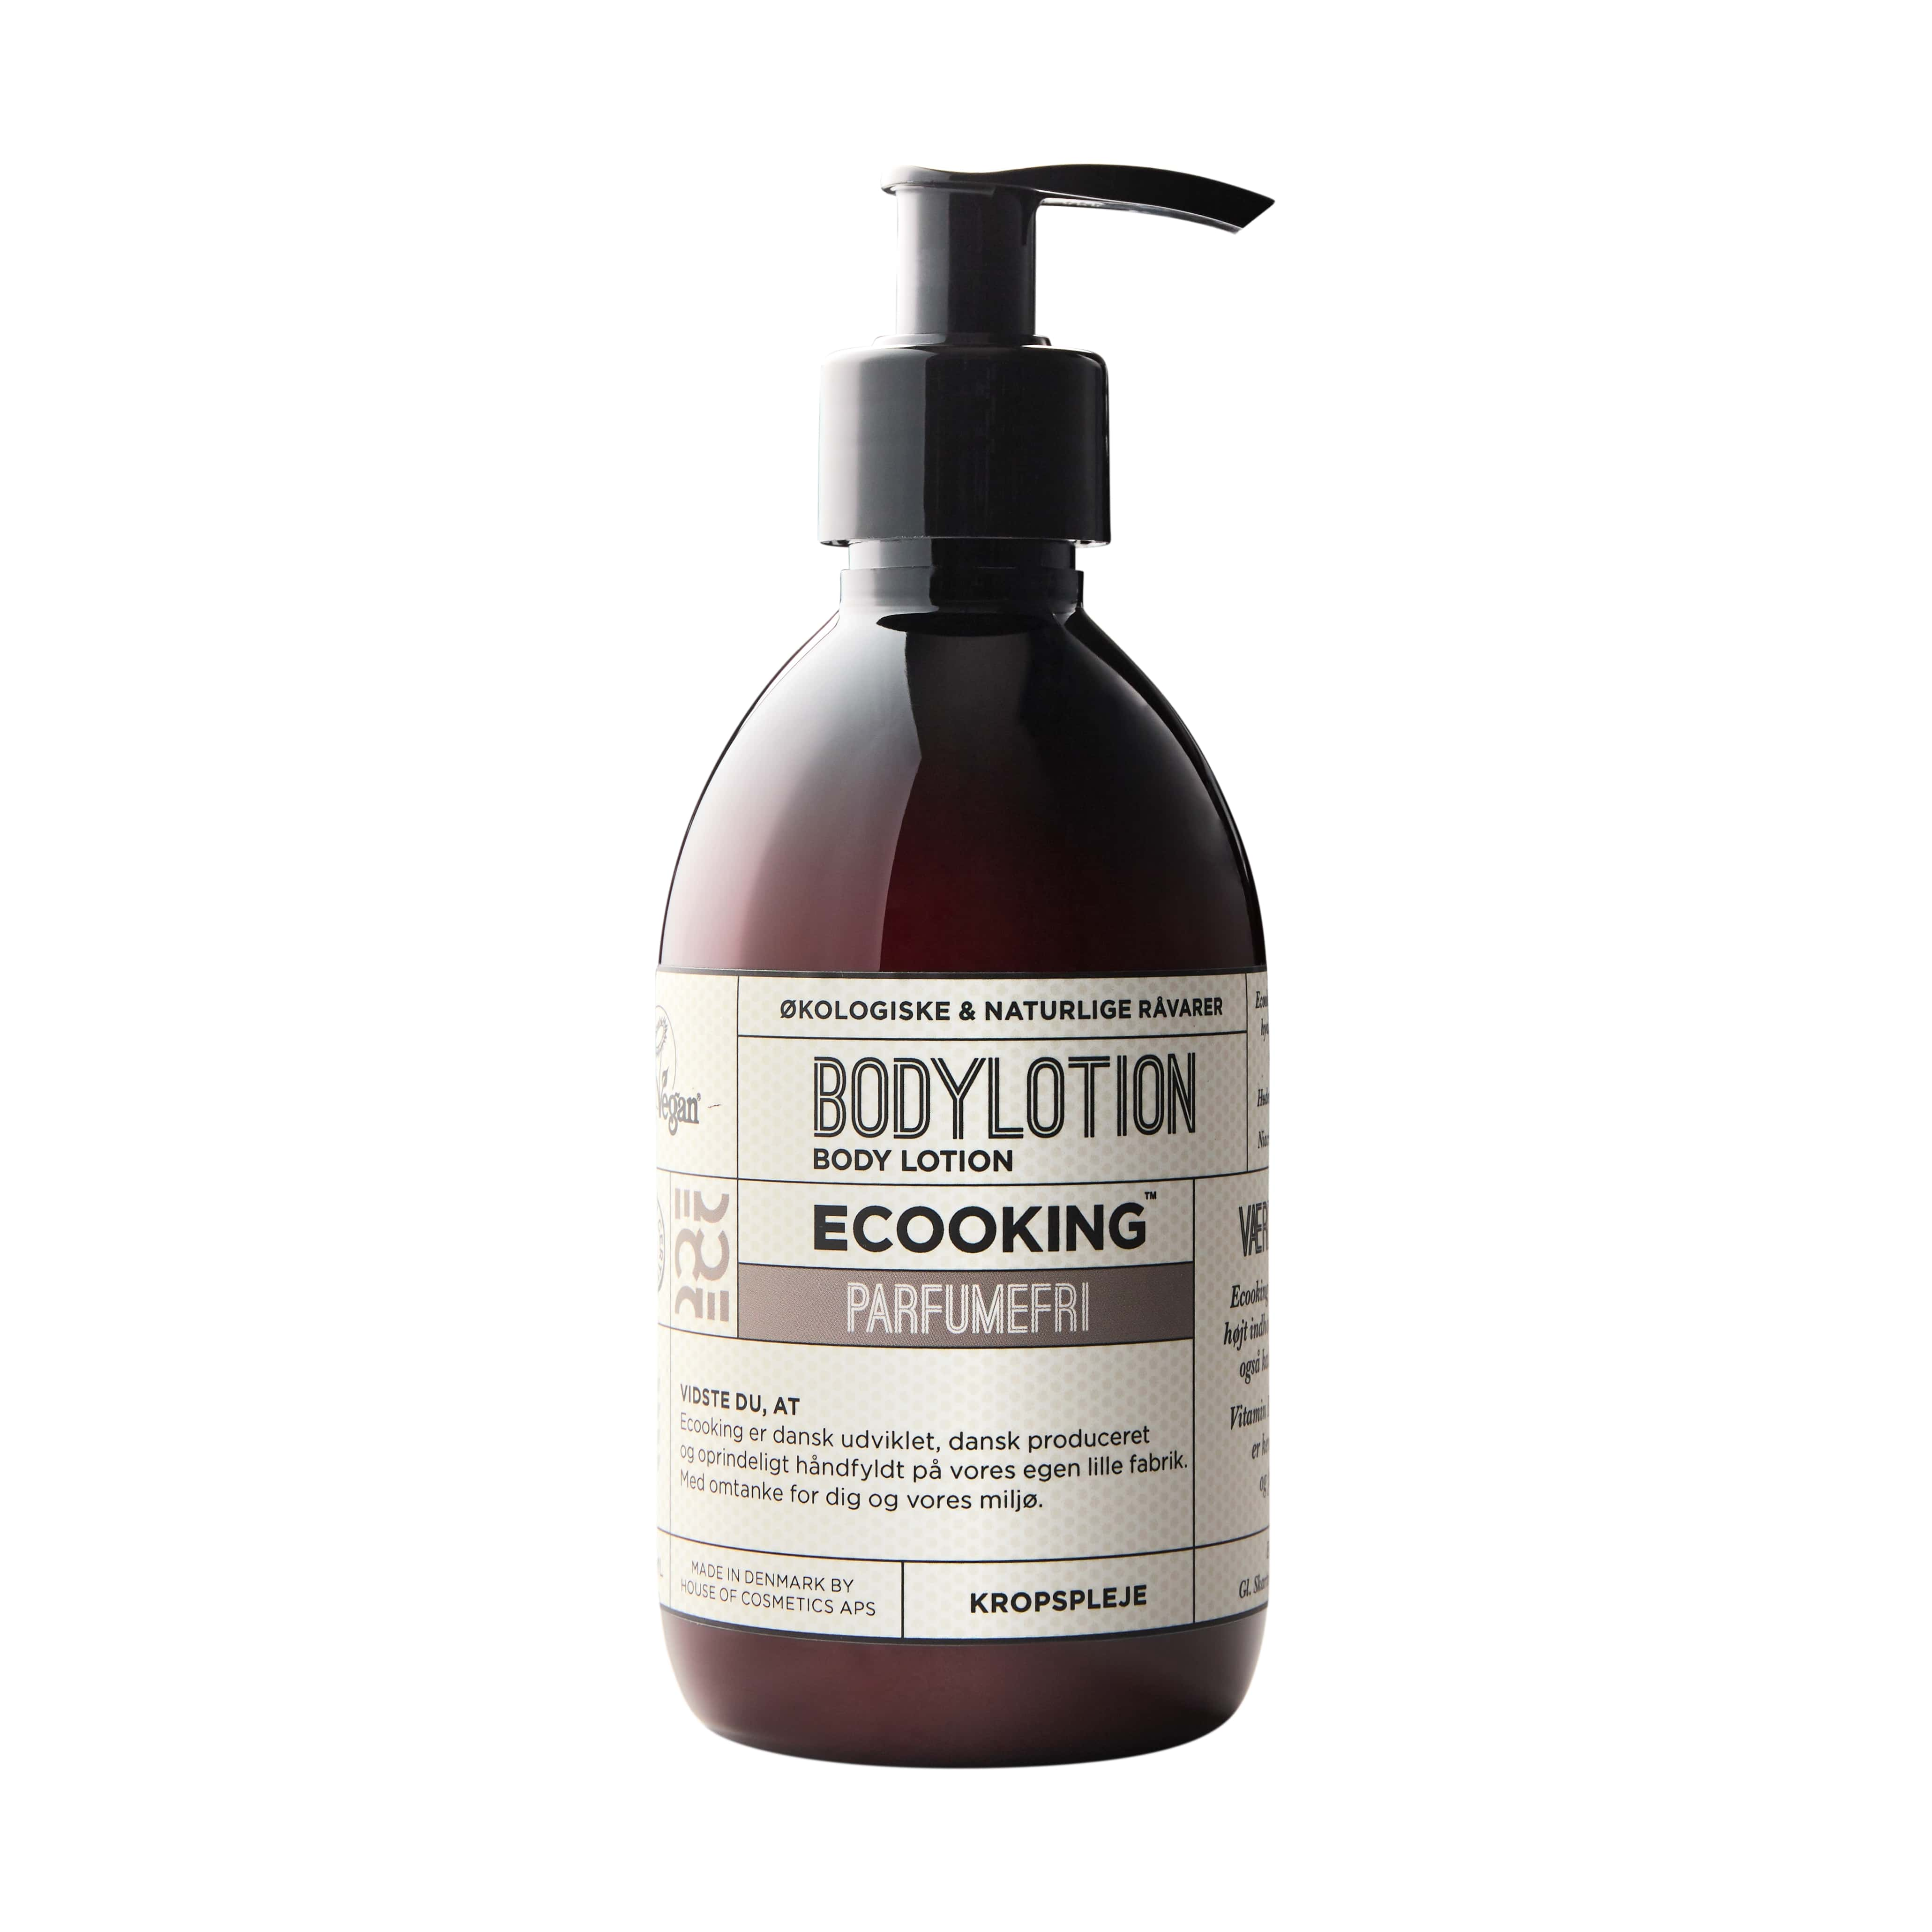 Ecooking Bodylotion Parfumefri, 300 ml